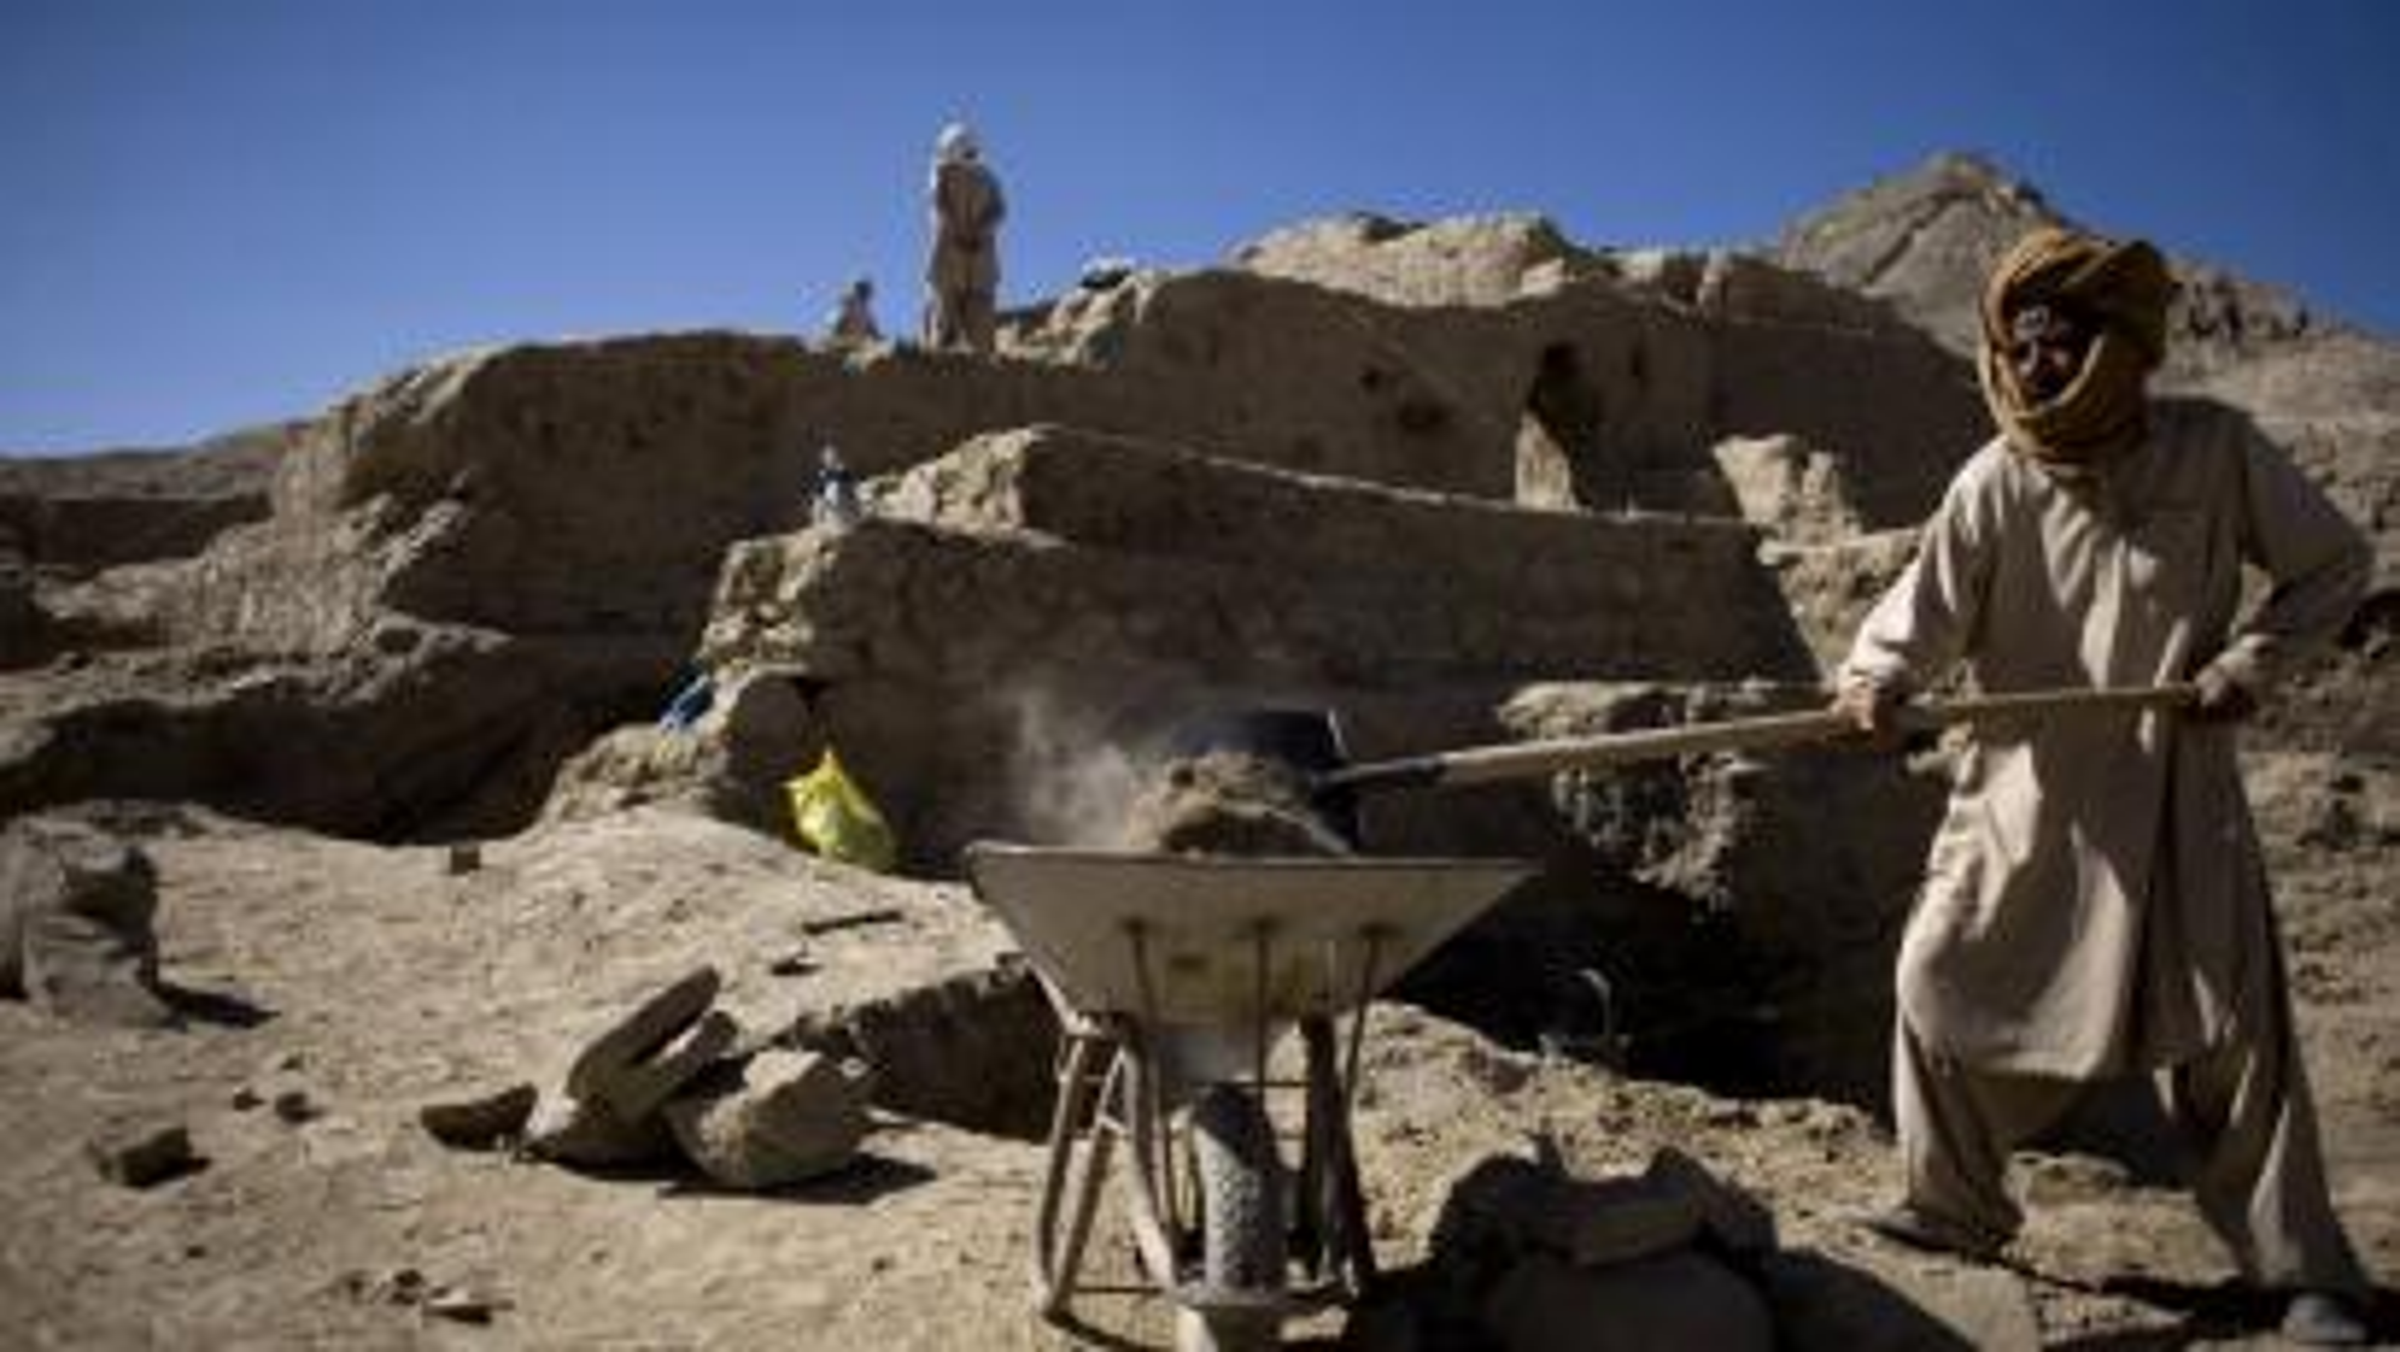 Aynak copper mine, Afghanistan